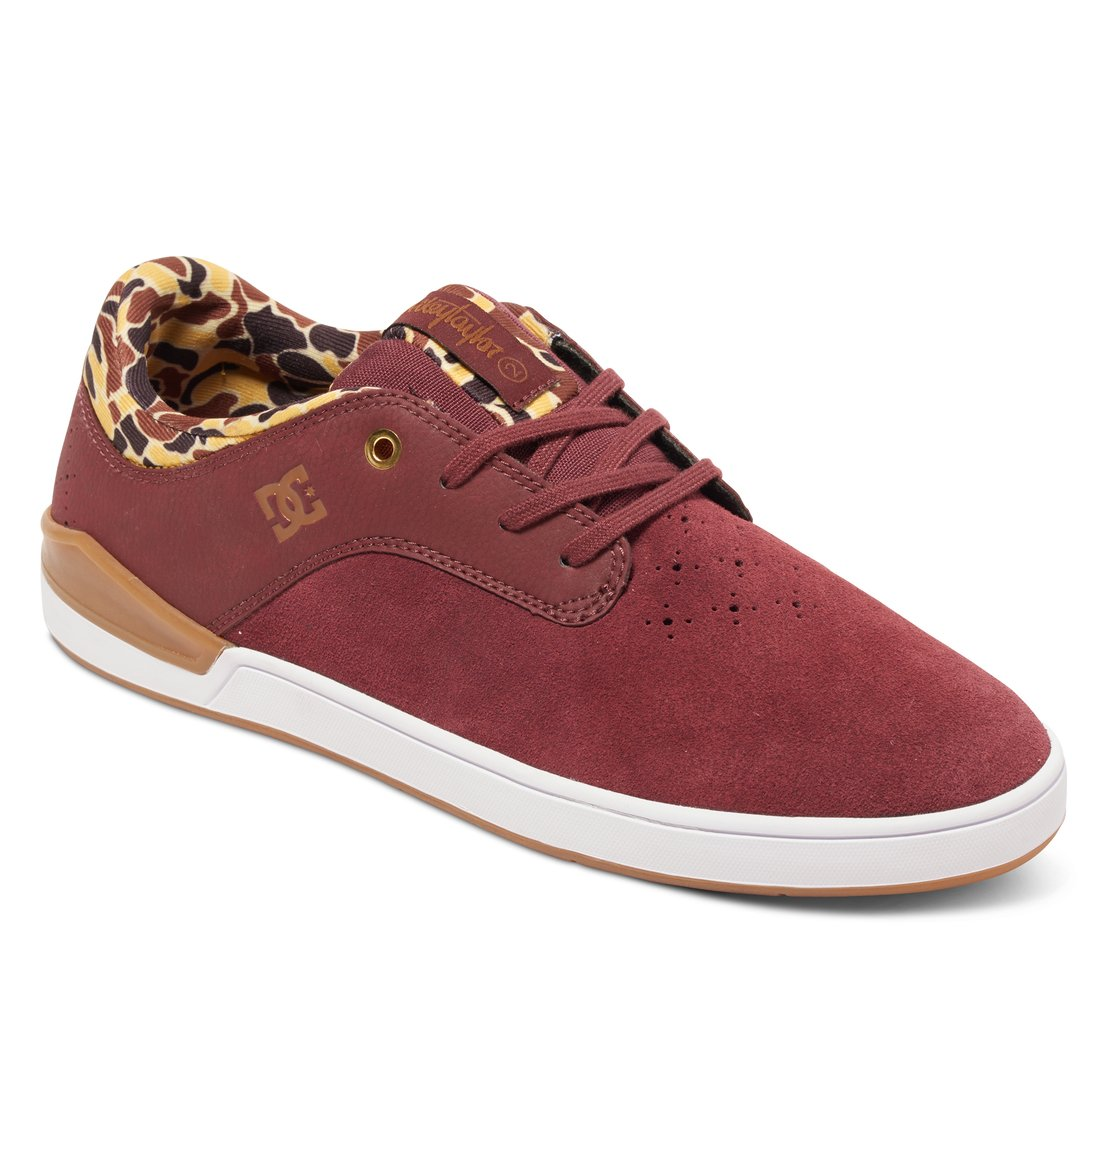 Mikey Taylor Dc Cognac Sneaker hXbUoRv1t